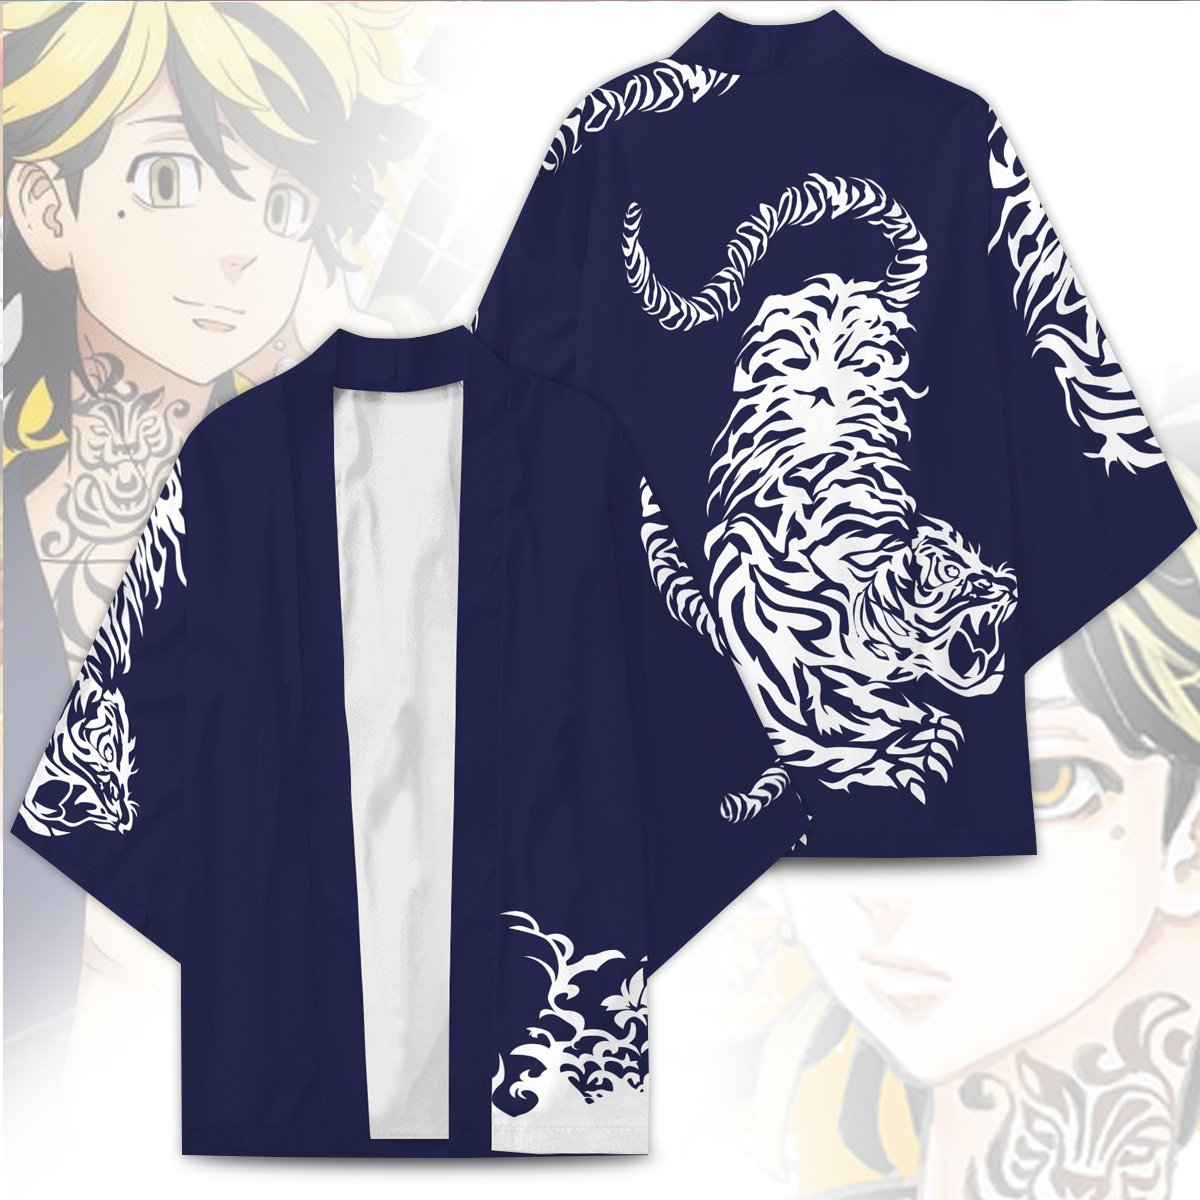 hanemiya kimono 864723 - Otaku Treat